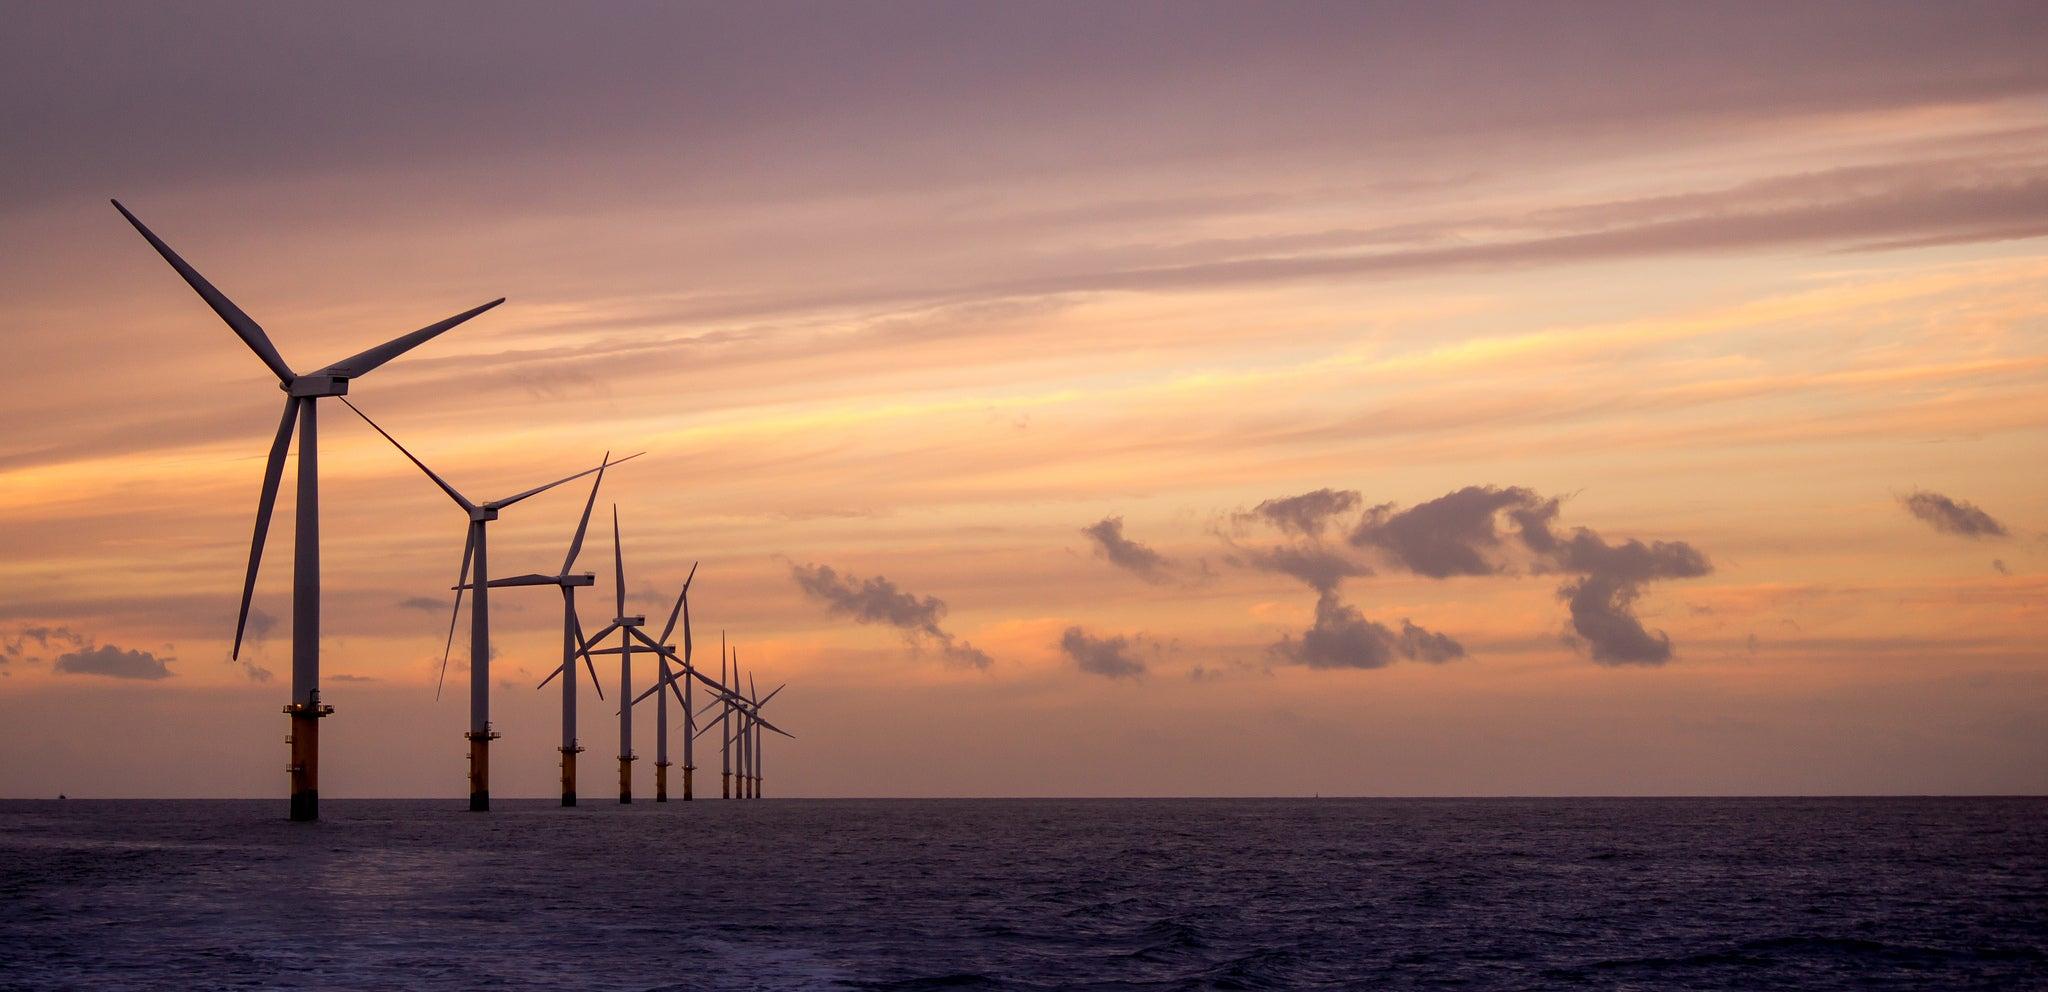 dong-energy energy uk wind wind-farm